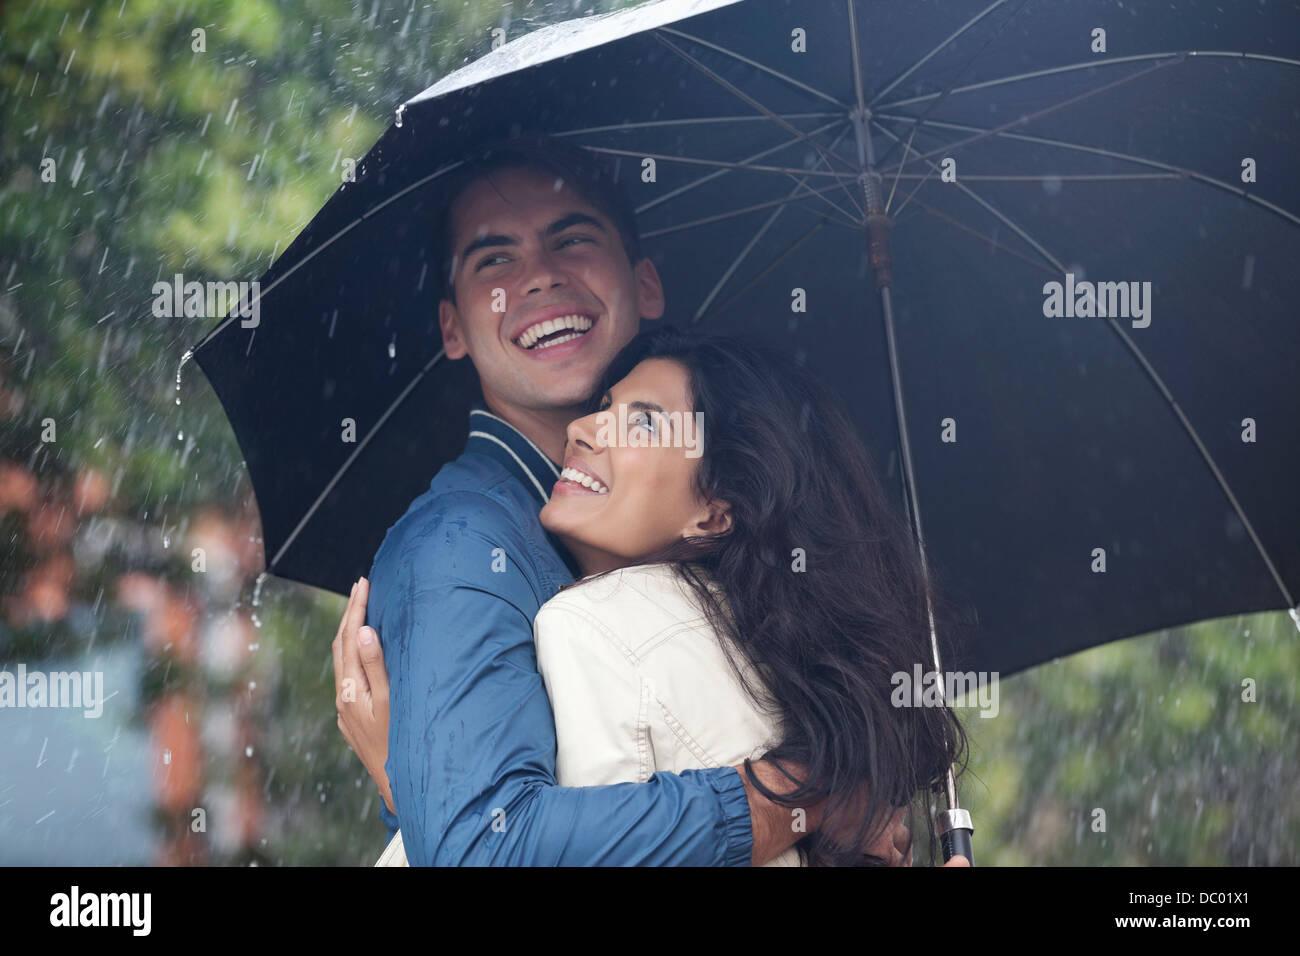 Happy couple hugging under umbrella in rain stock image